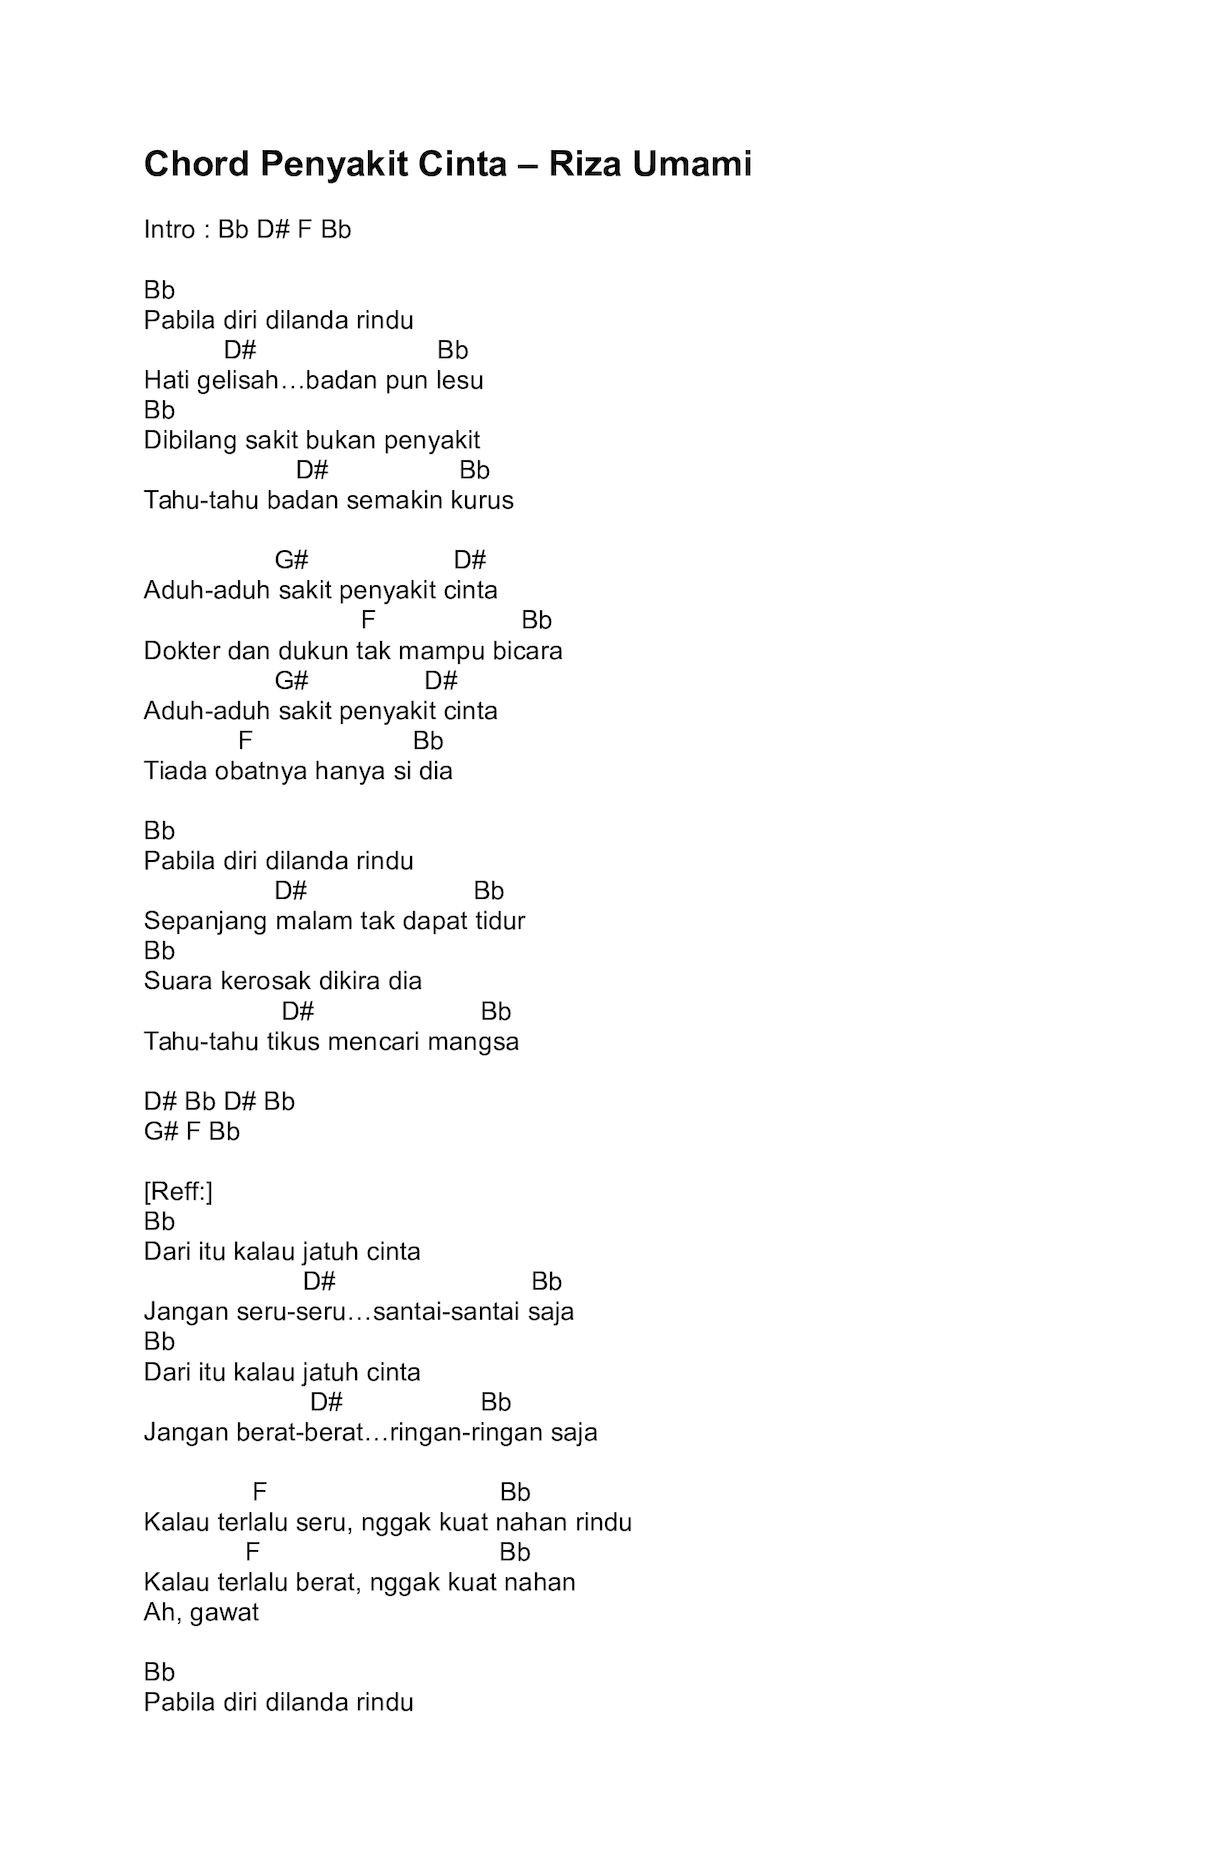 Chord Gitar dan Lirik Steven & Coconut Treez - Lagu Santai